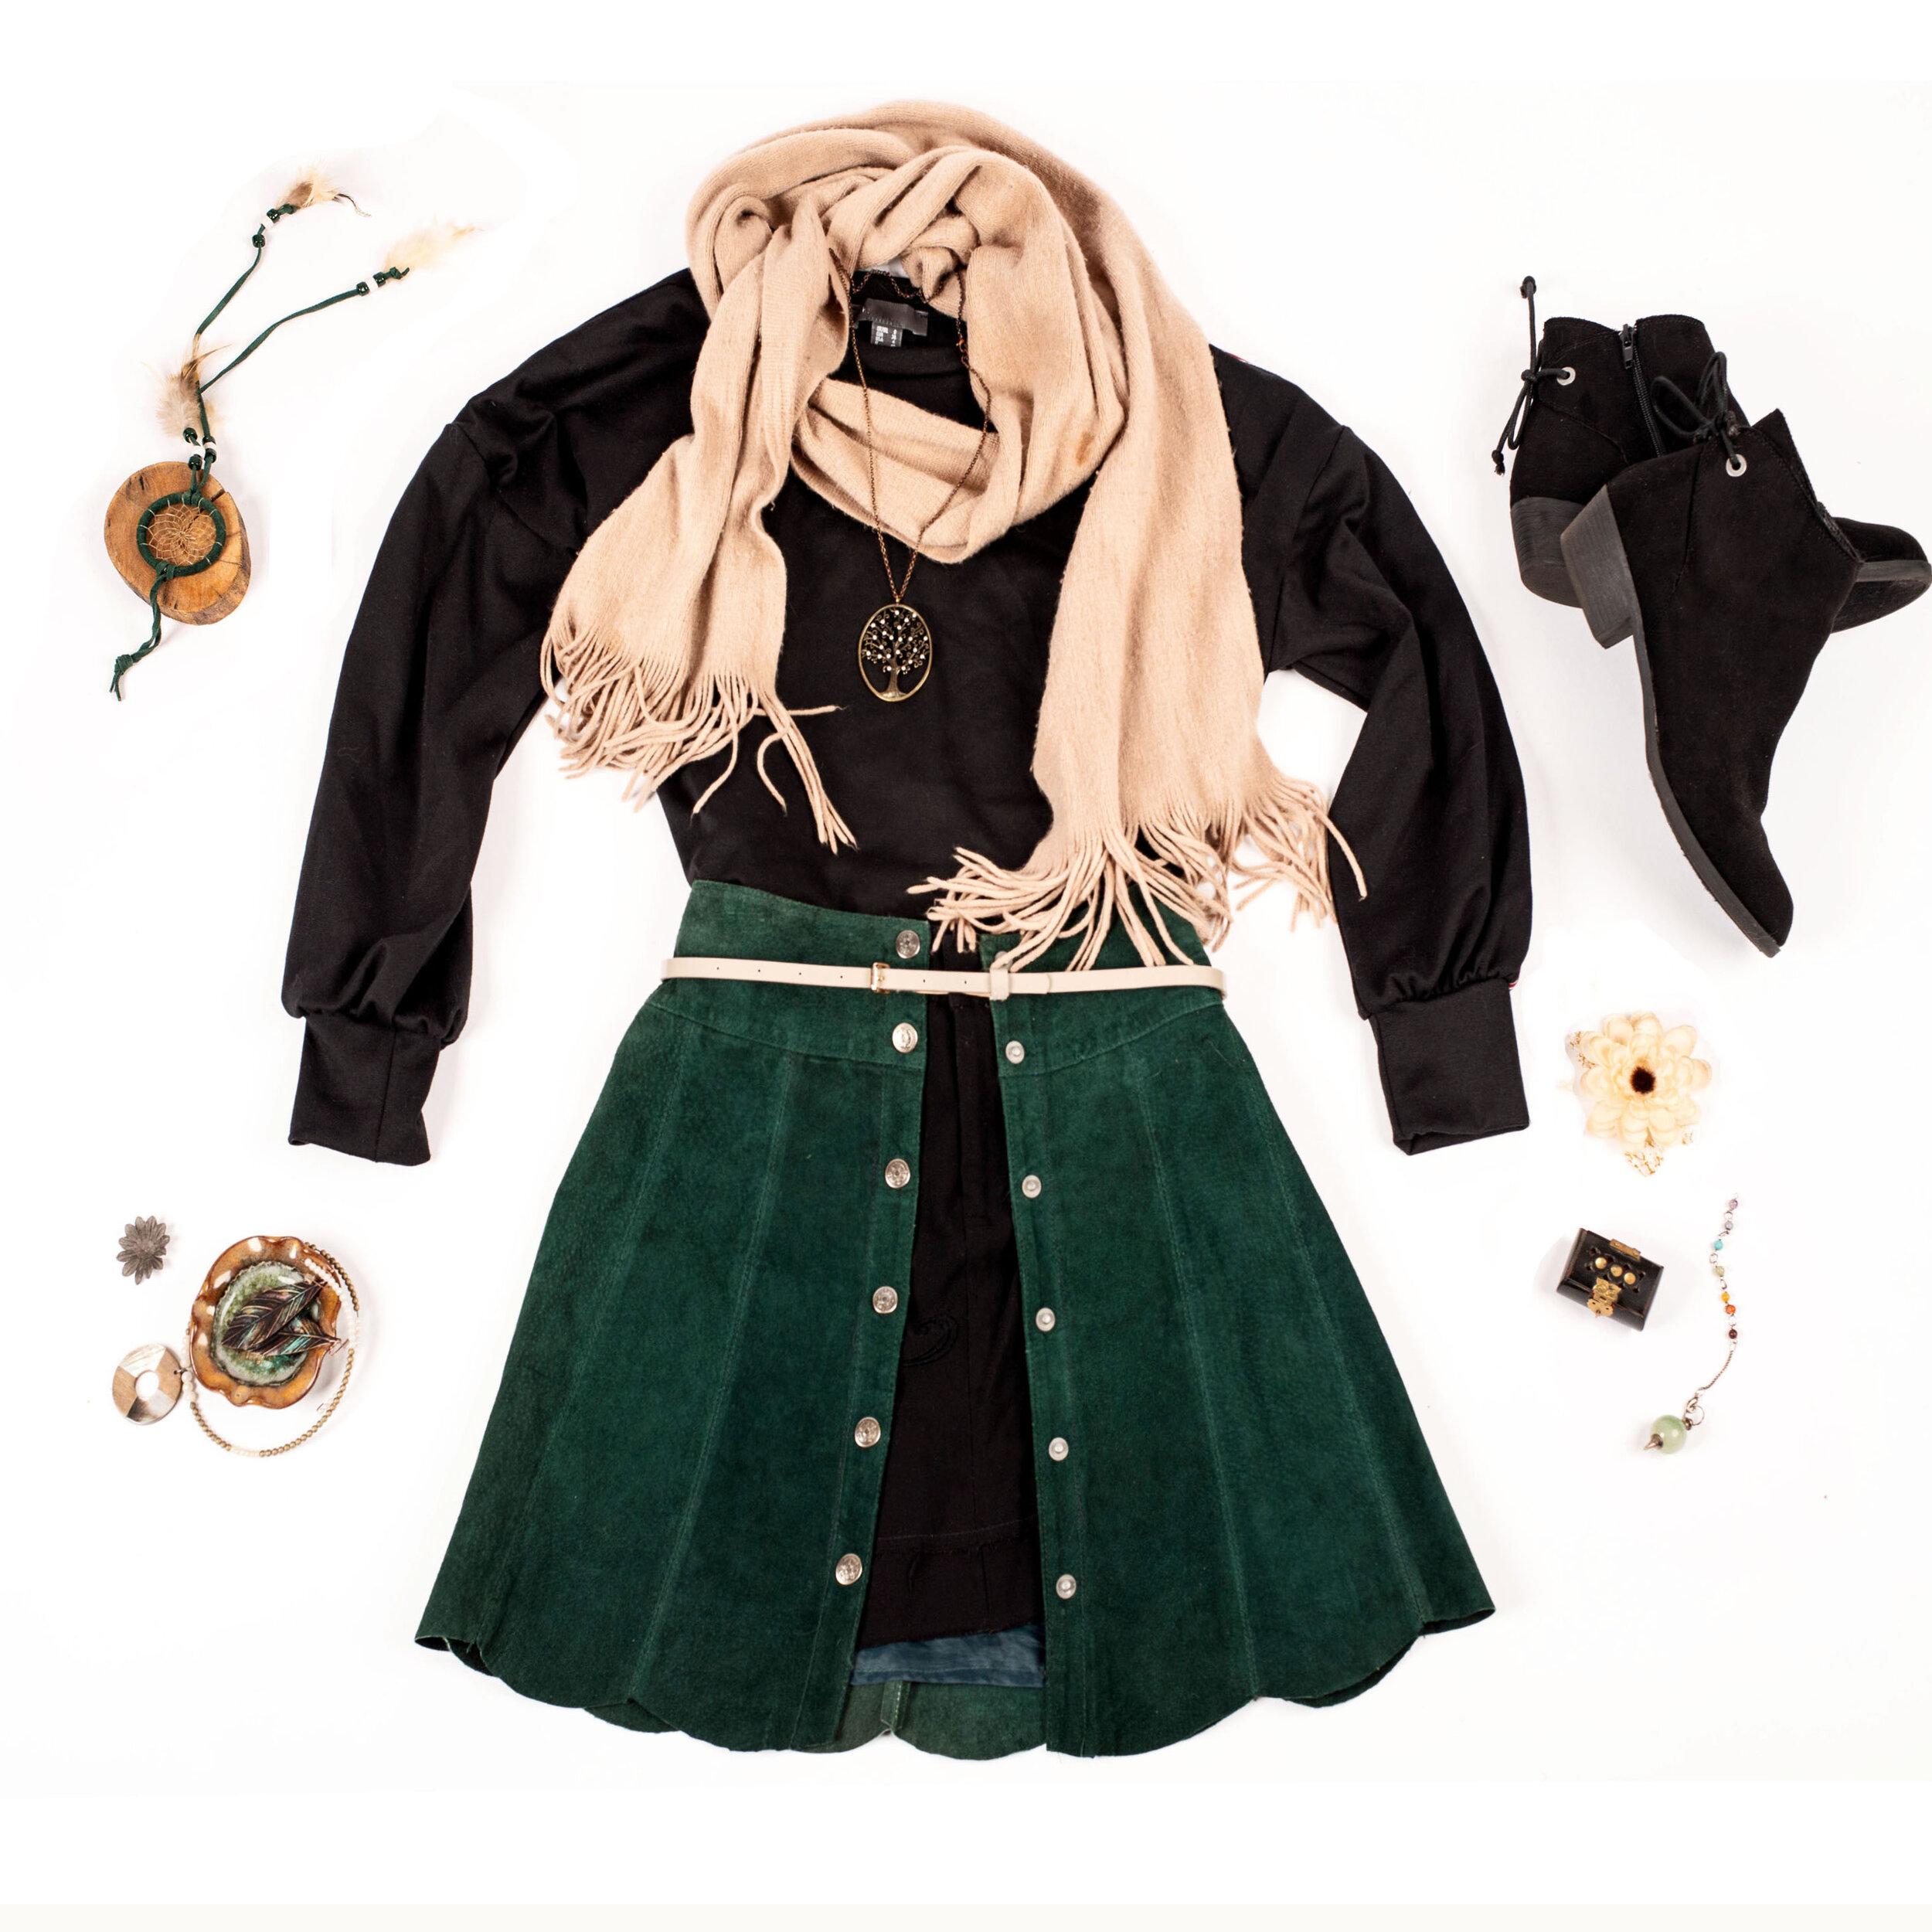 deanna kei meg zano Fall fashion styling outfit green skirt.jpg